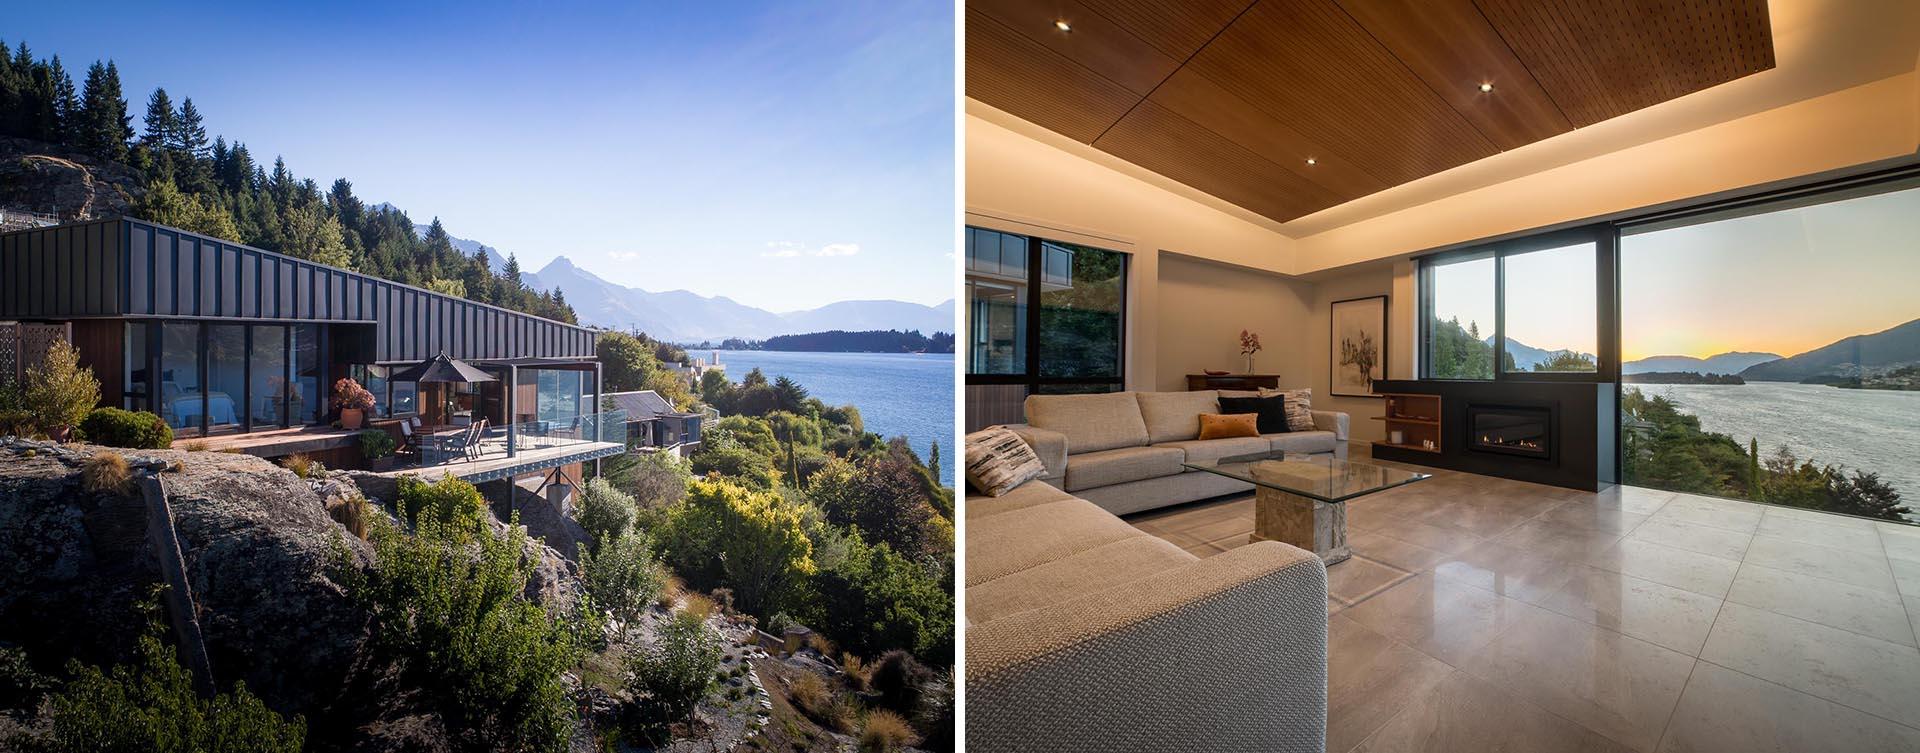 Hemma i Nya Zeeland med modern design och fantastisk utsikt